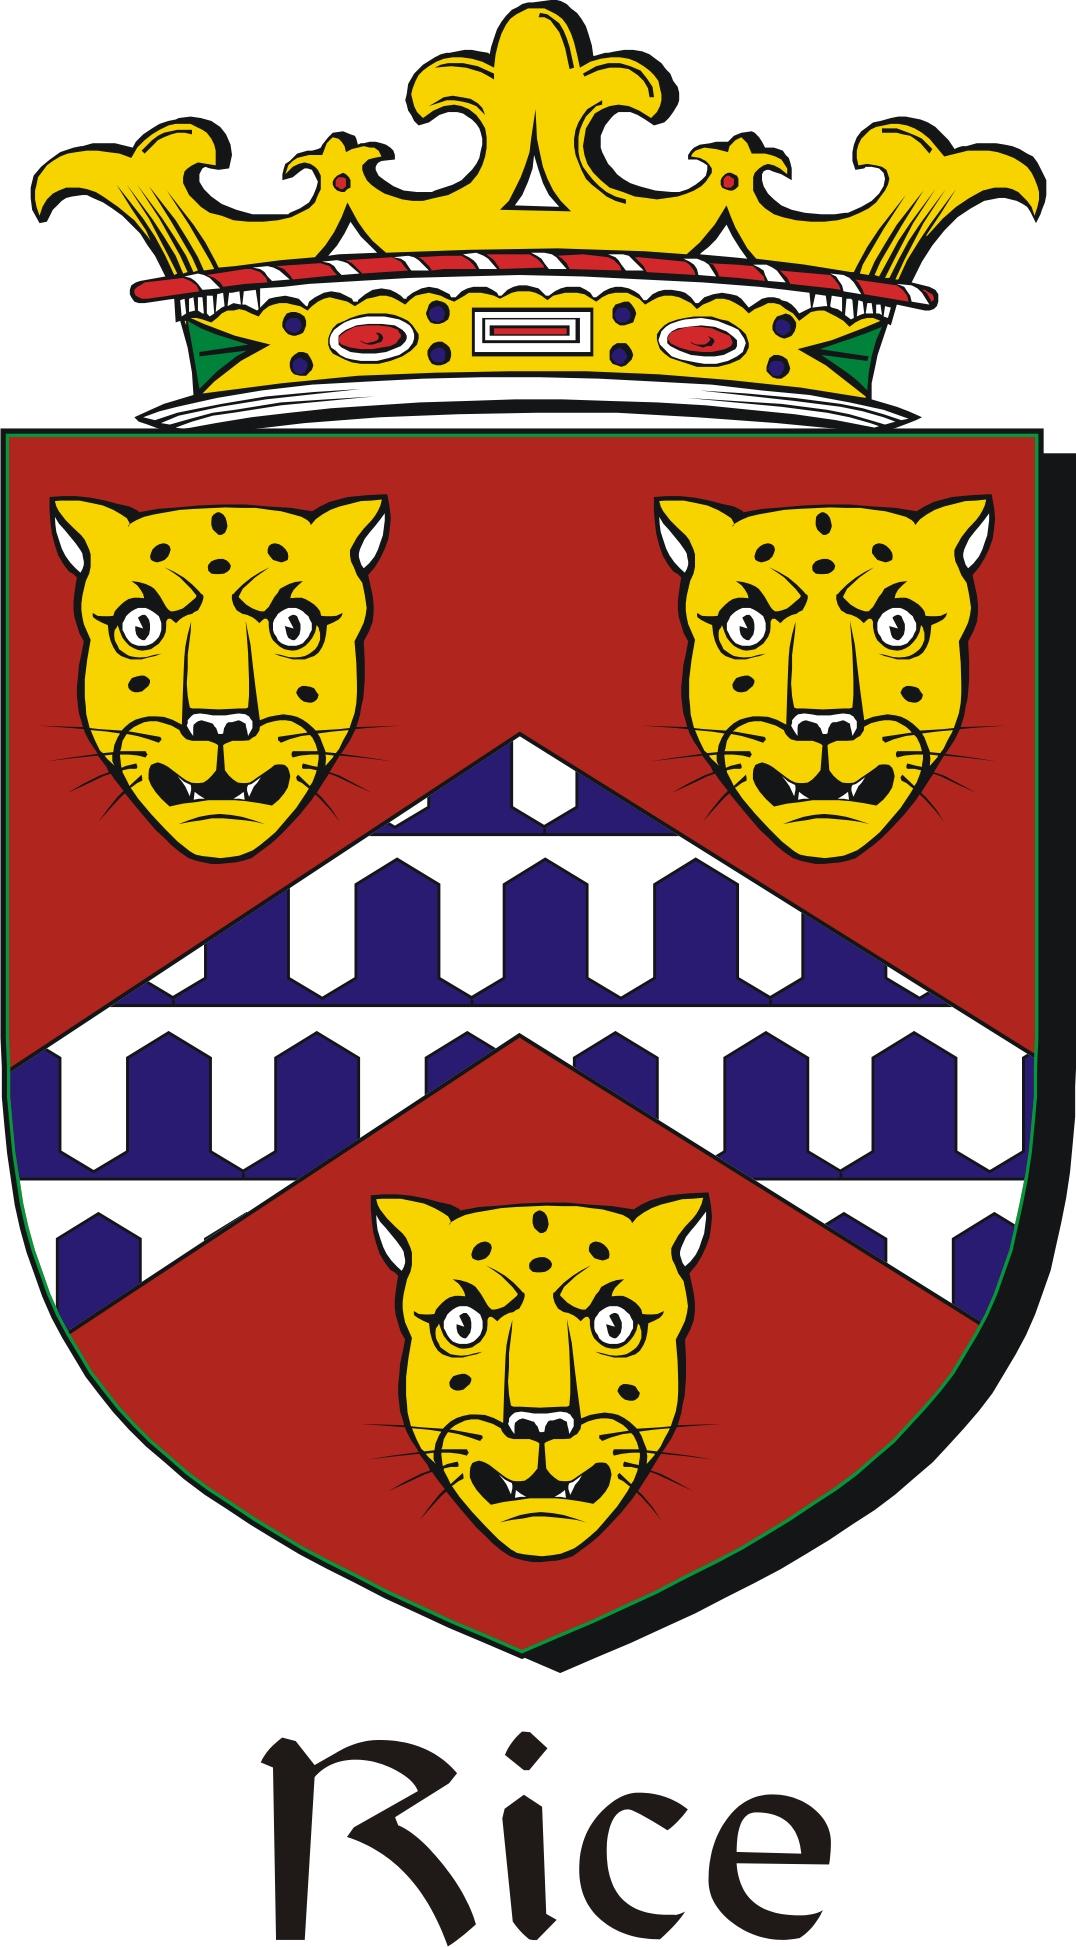 Rice family crest irish coat of arms image download download fa rice family crest irish coat of arms image download download fa buycottarizona Images